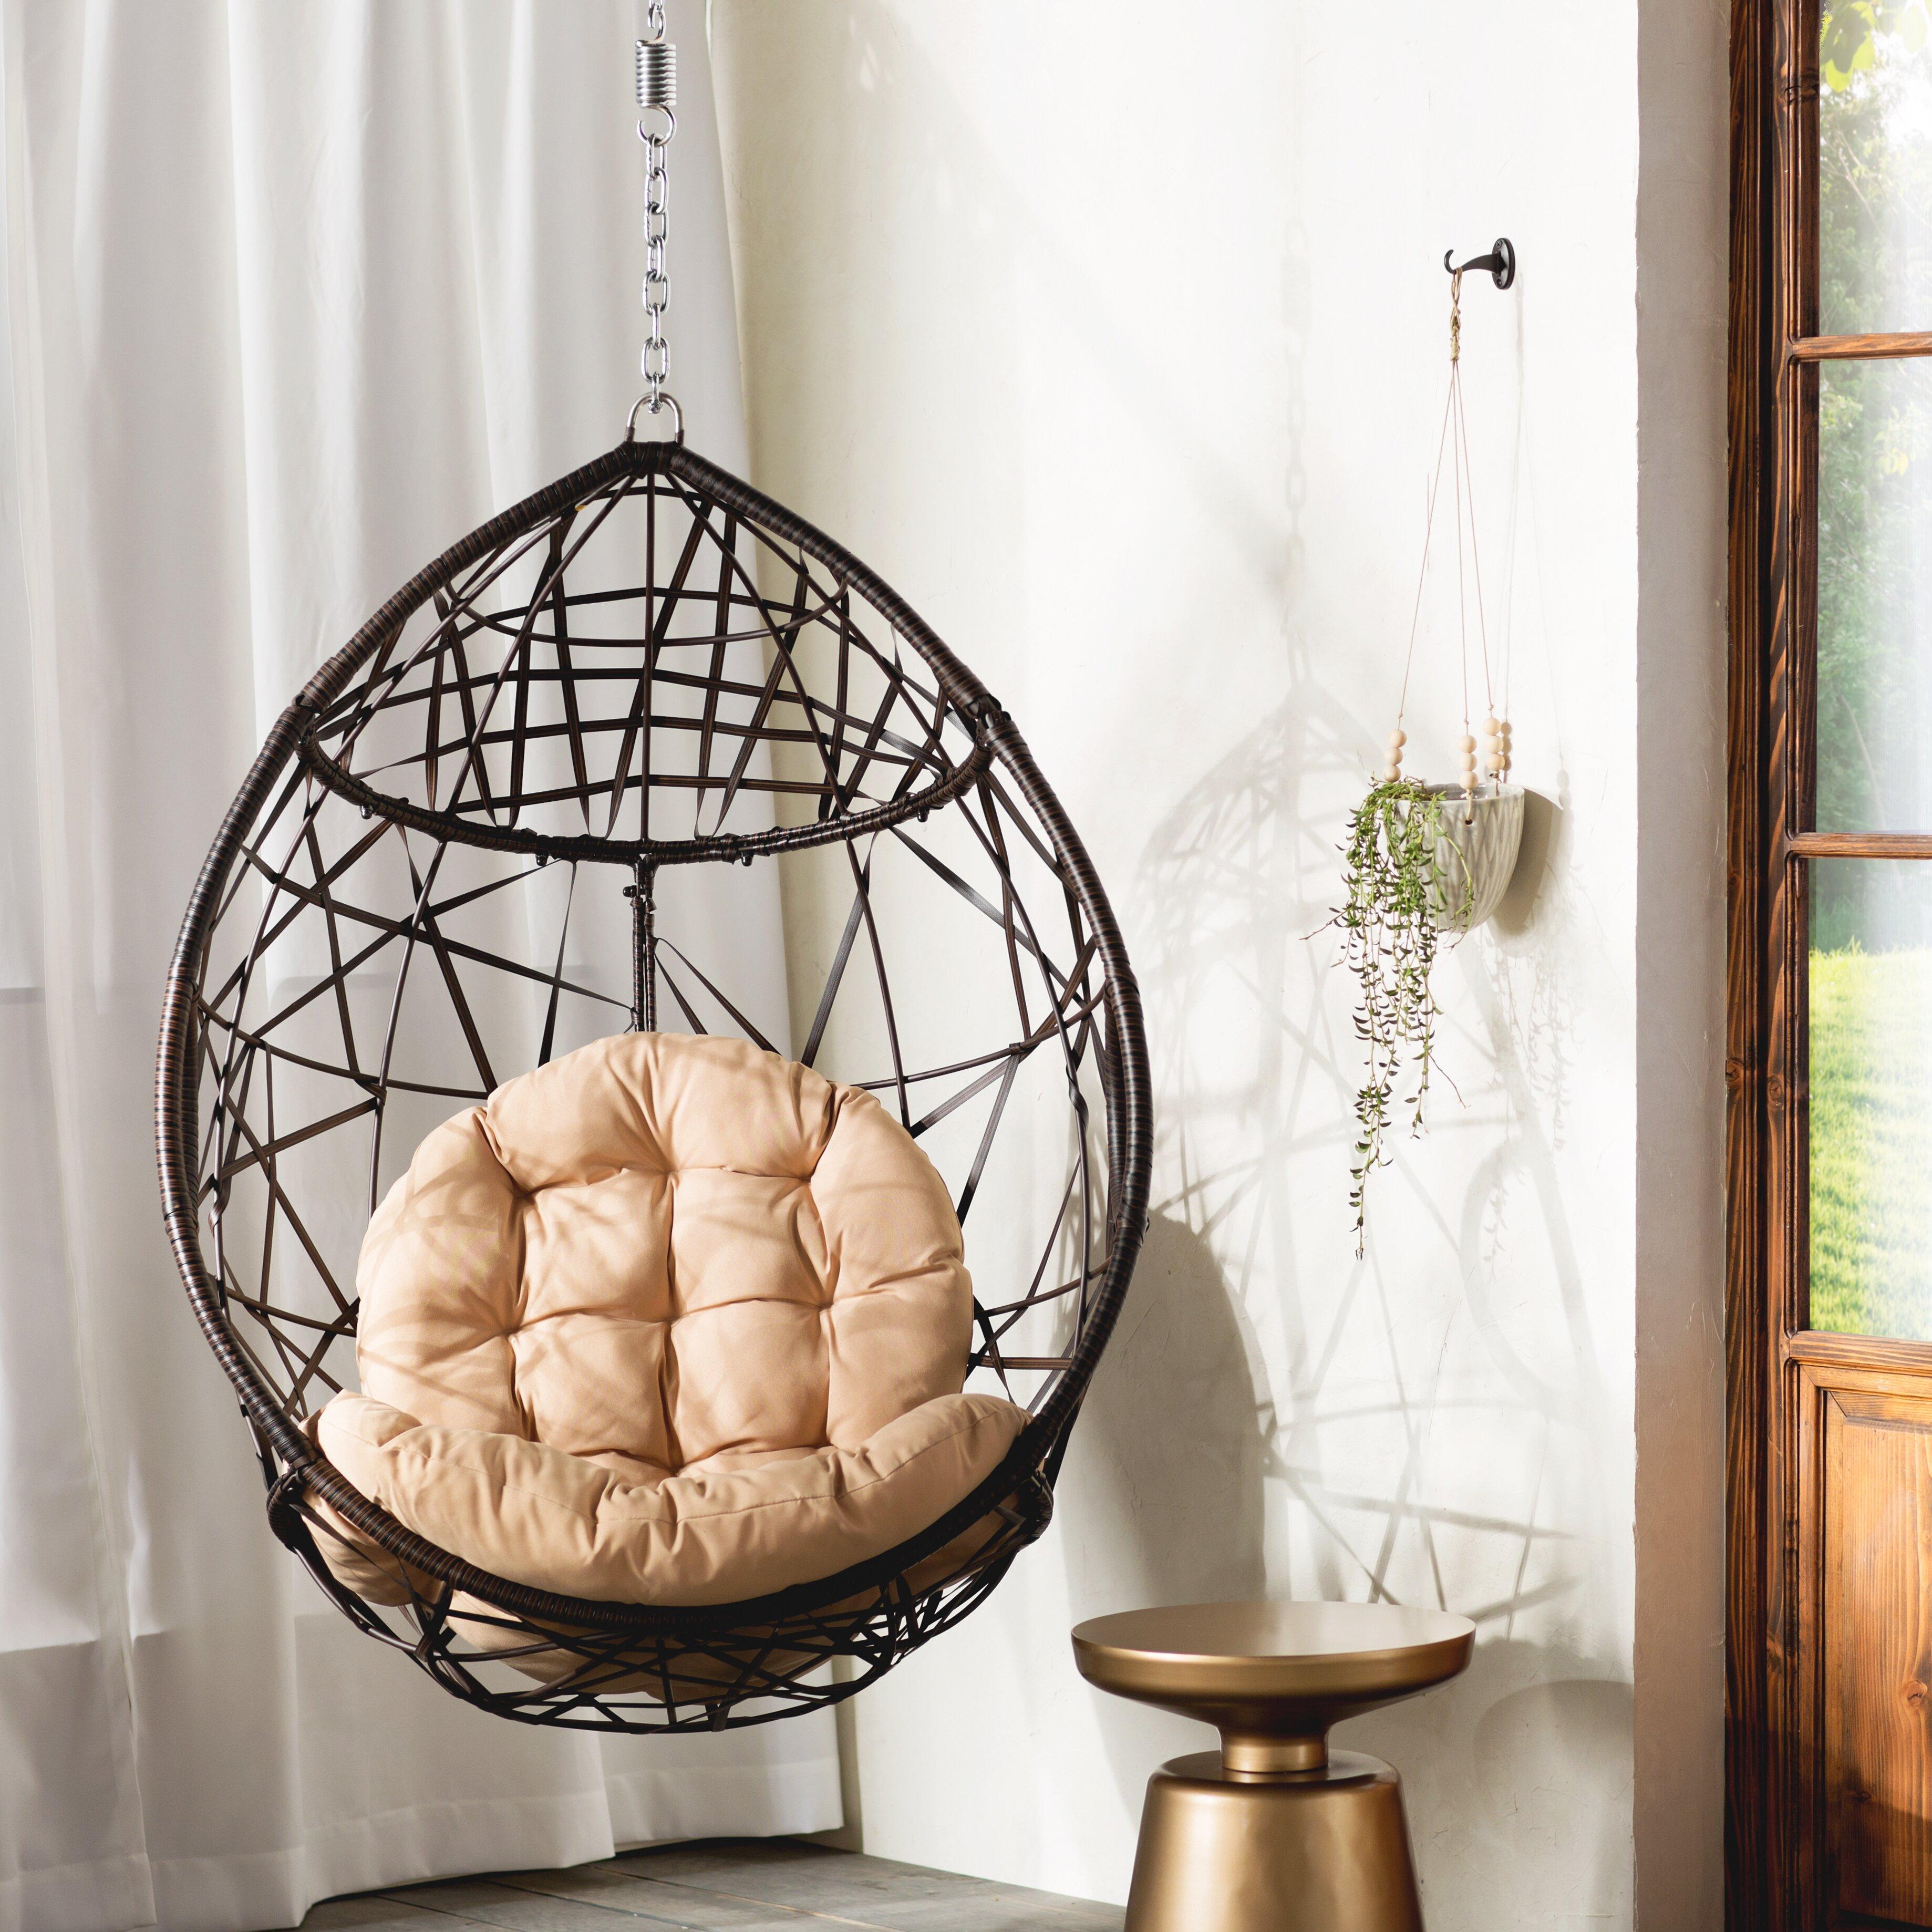 Swing Chair In Bedroom Design7001067 Bedroom Swing 17 Best Ideas About Bedroom Swing